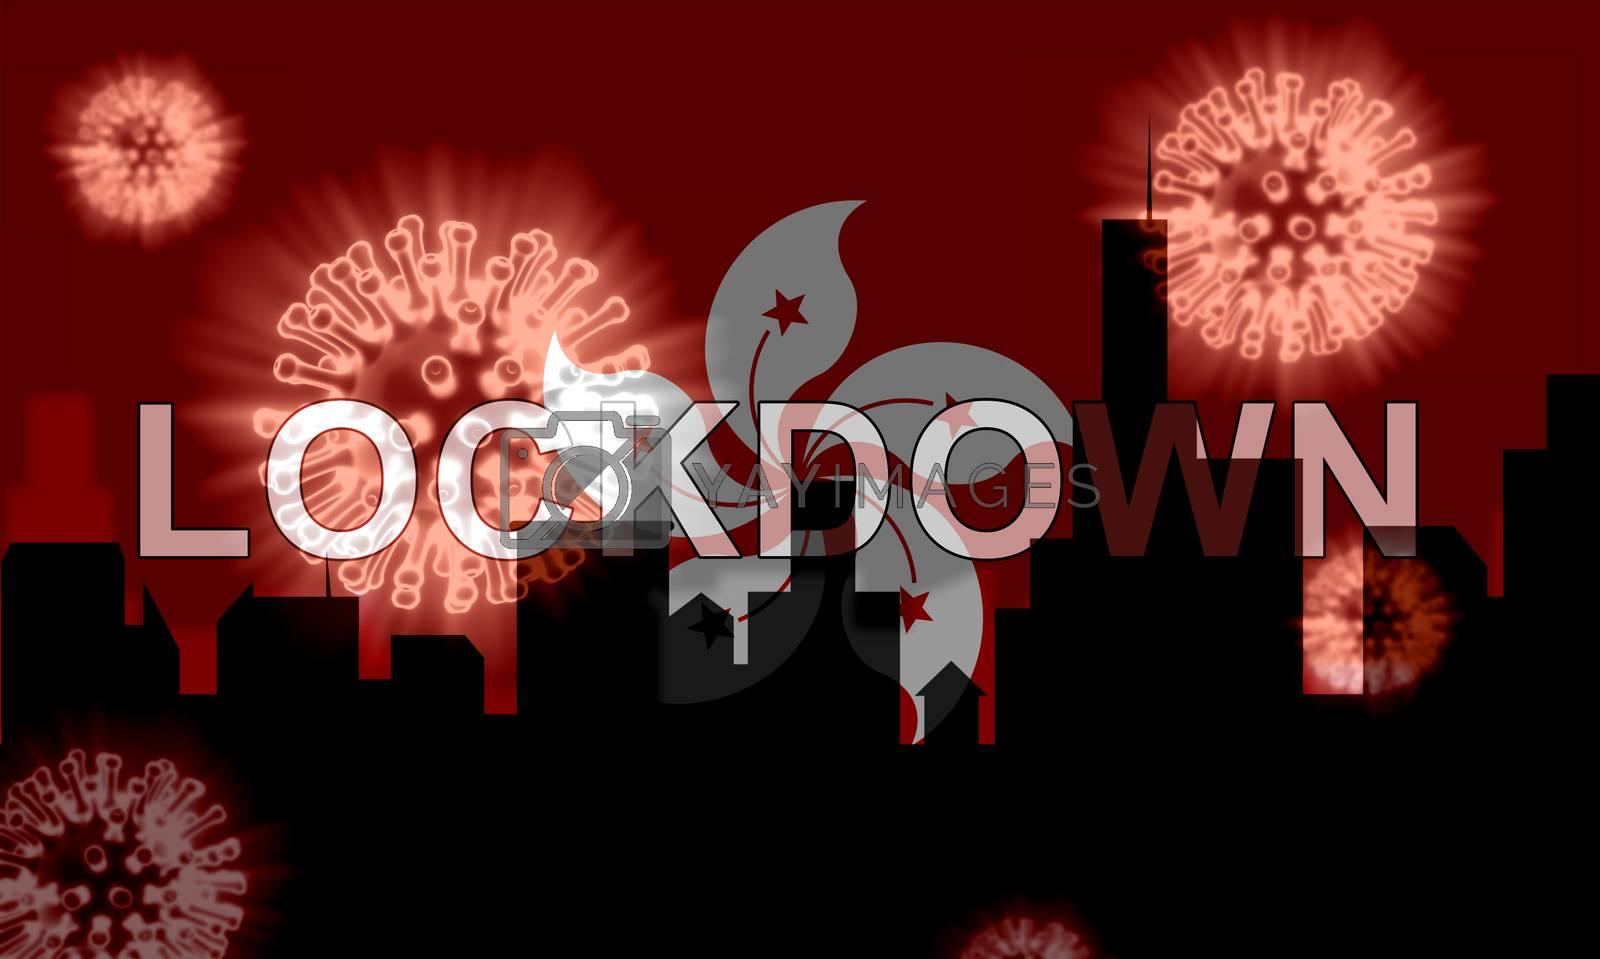 Hong Kong lockdown to stop coronavirus spread or outbreak. Covid 19 HK precaution to lock down virus infection - 3d Illustration